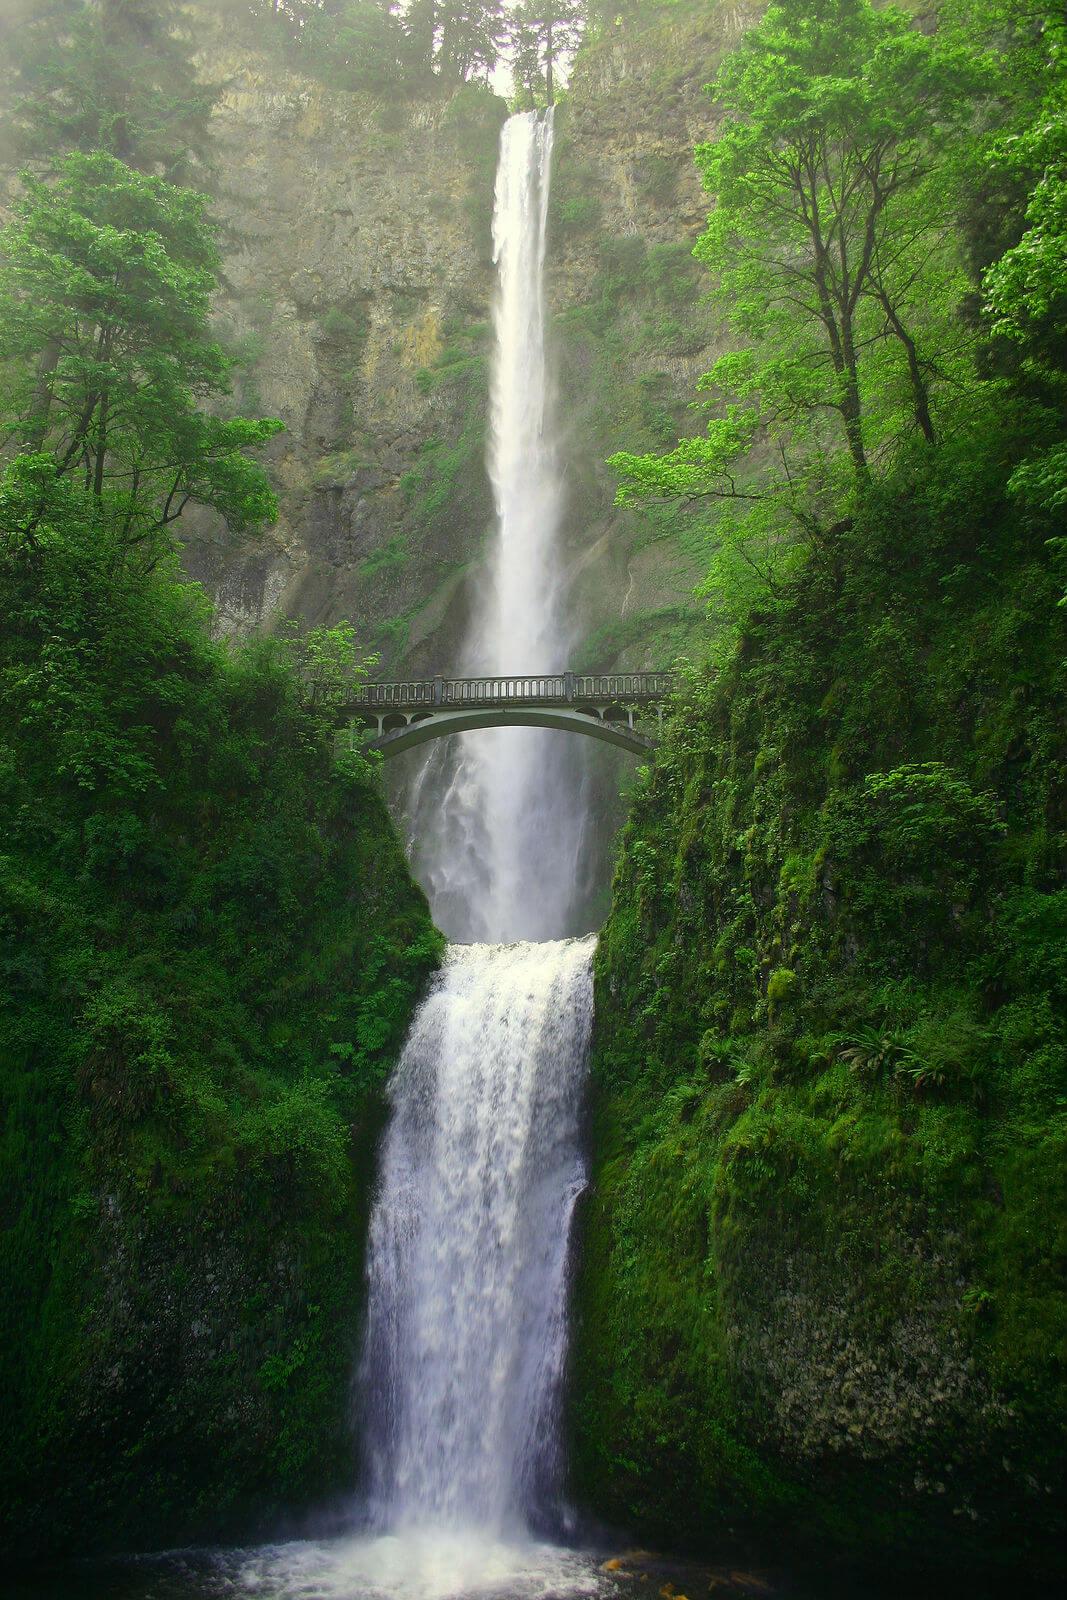 Splendid Waterfalls Of The World